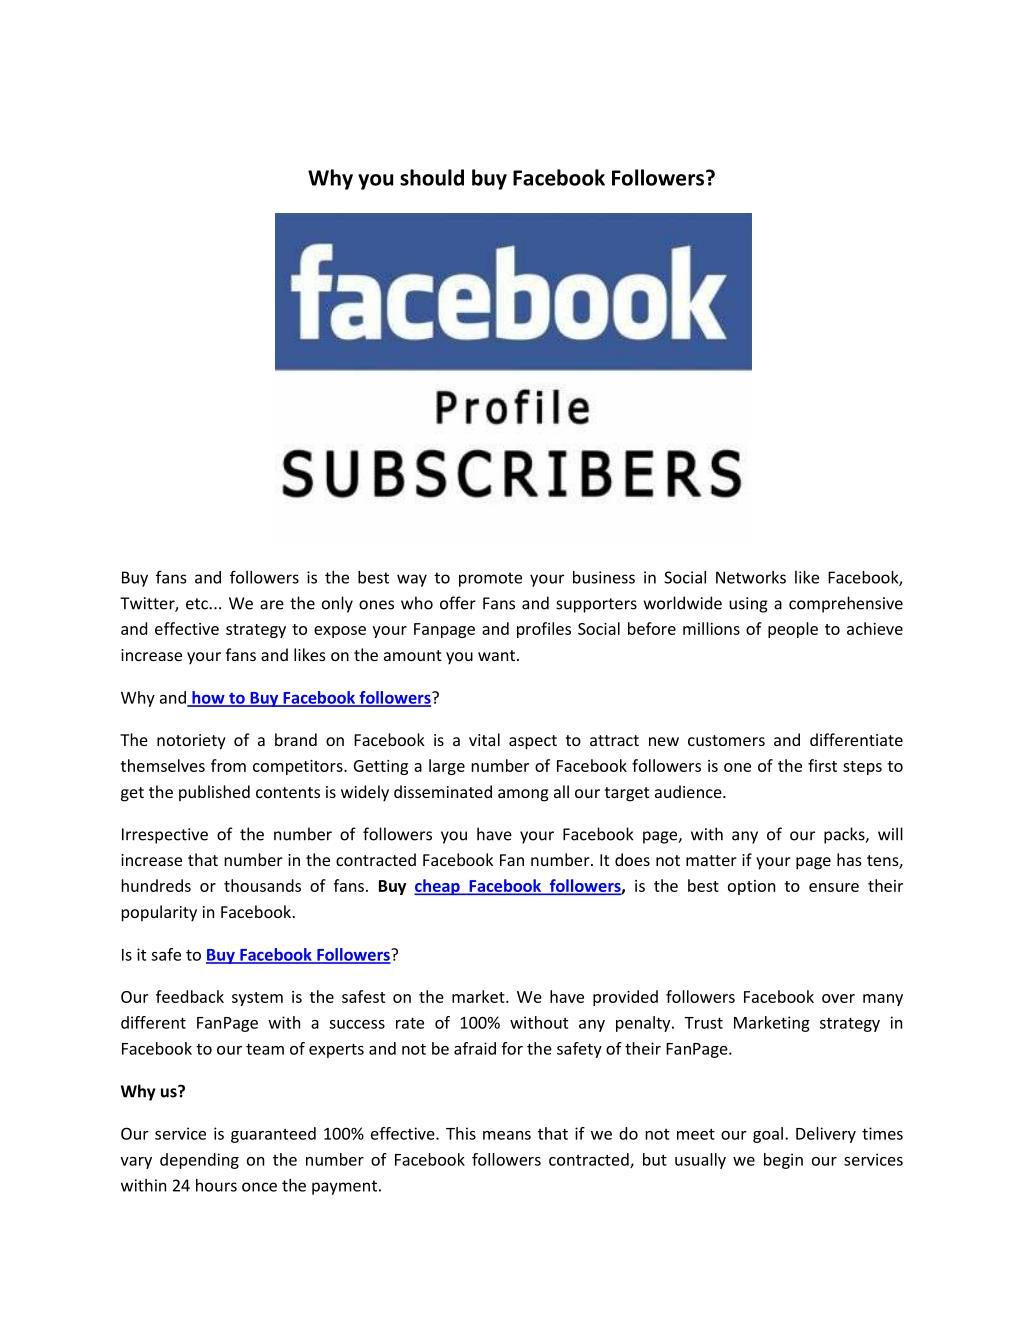 Xxx Male pinoy hunks vergin free videos watch download